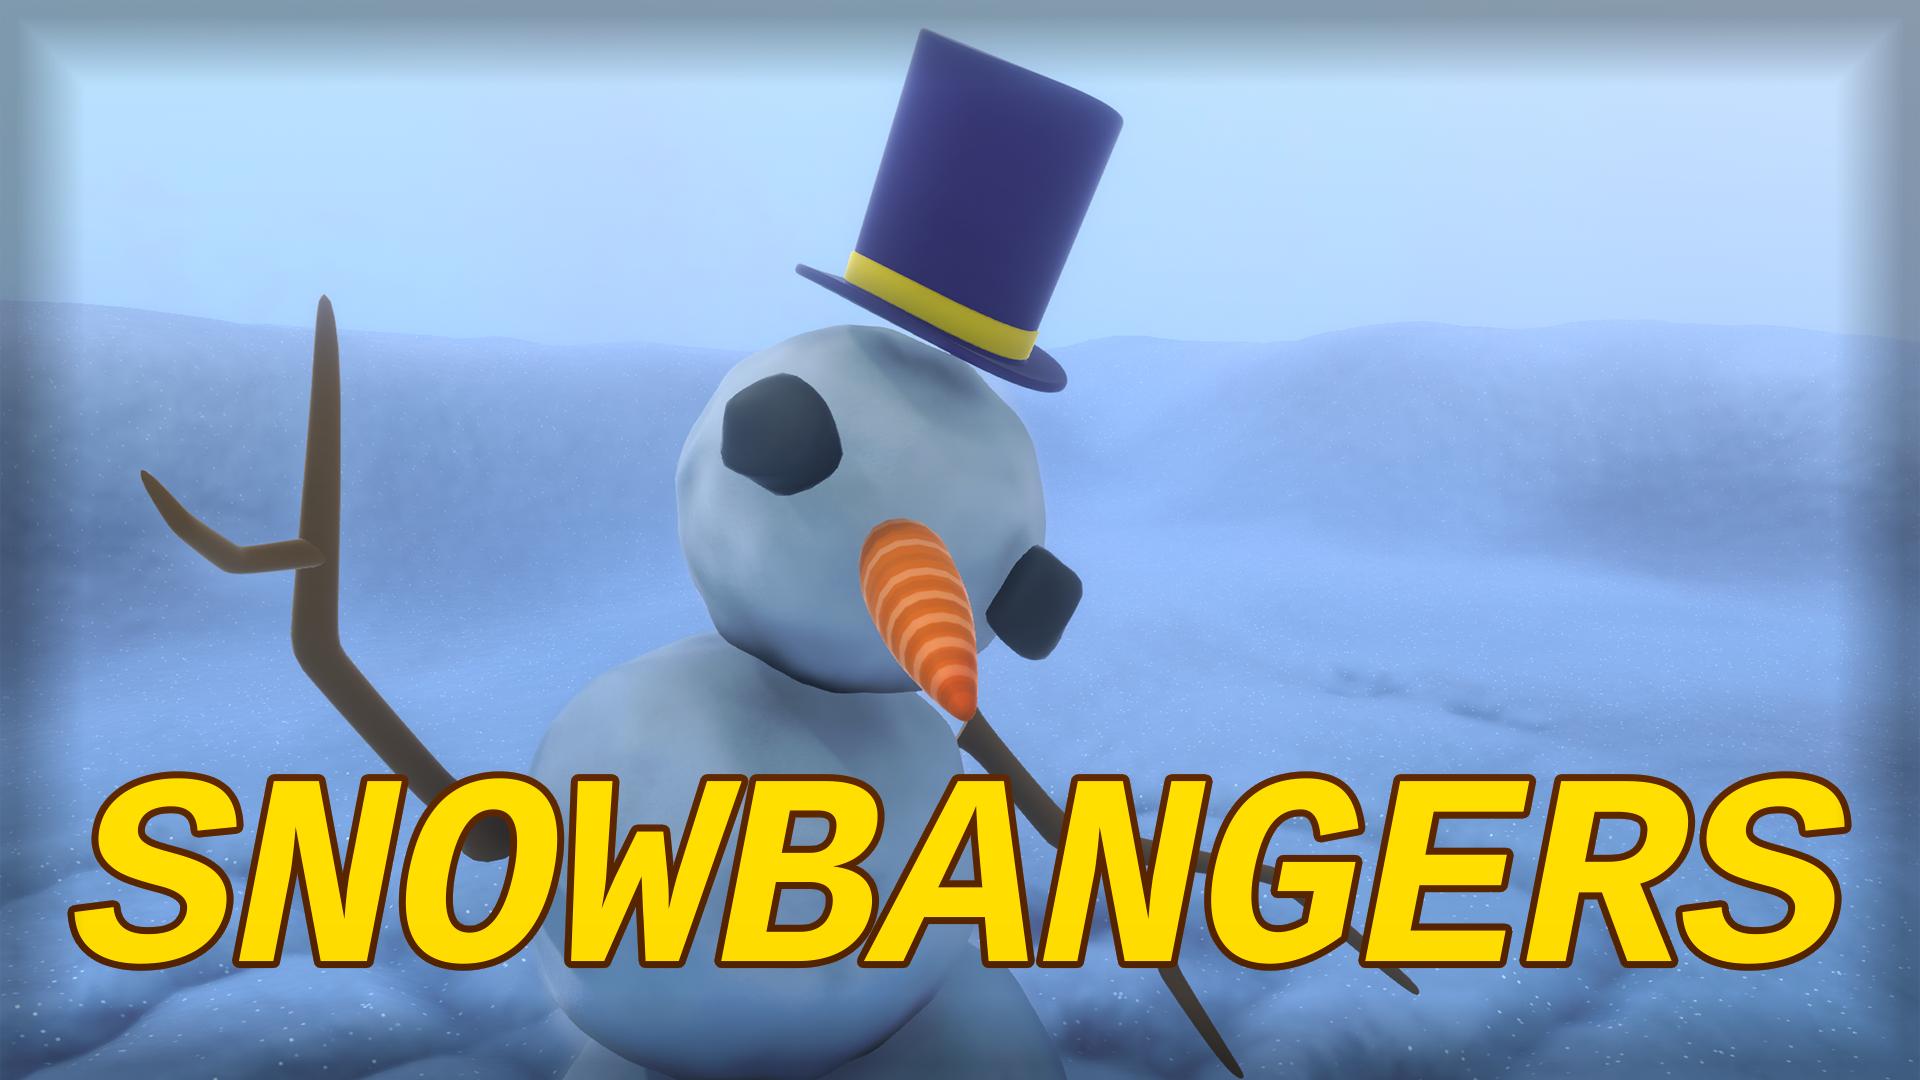 Snowbangers